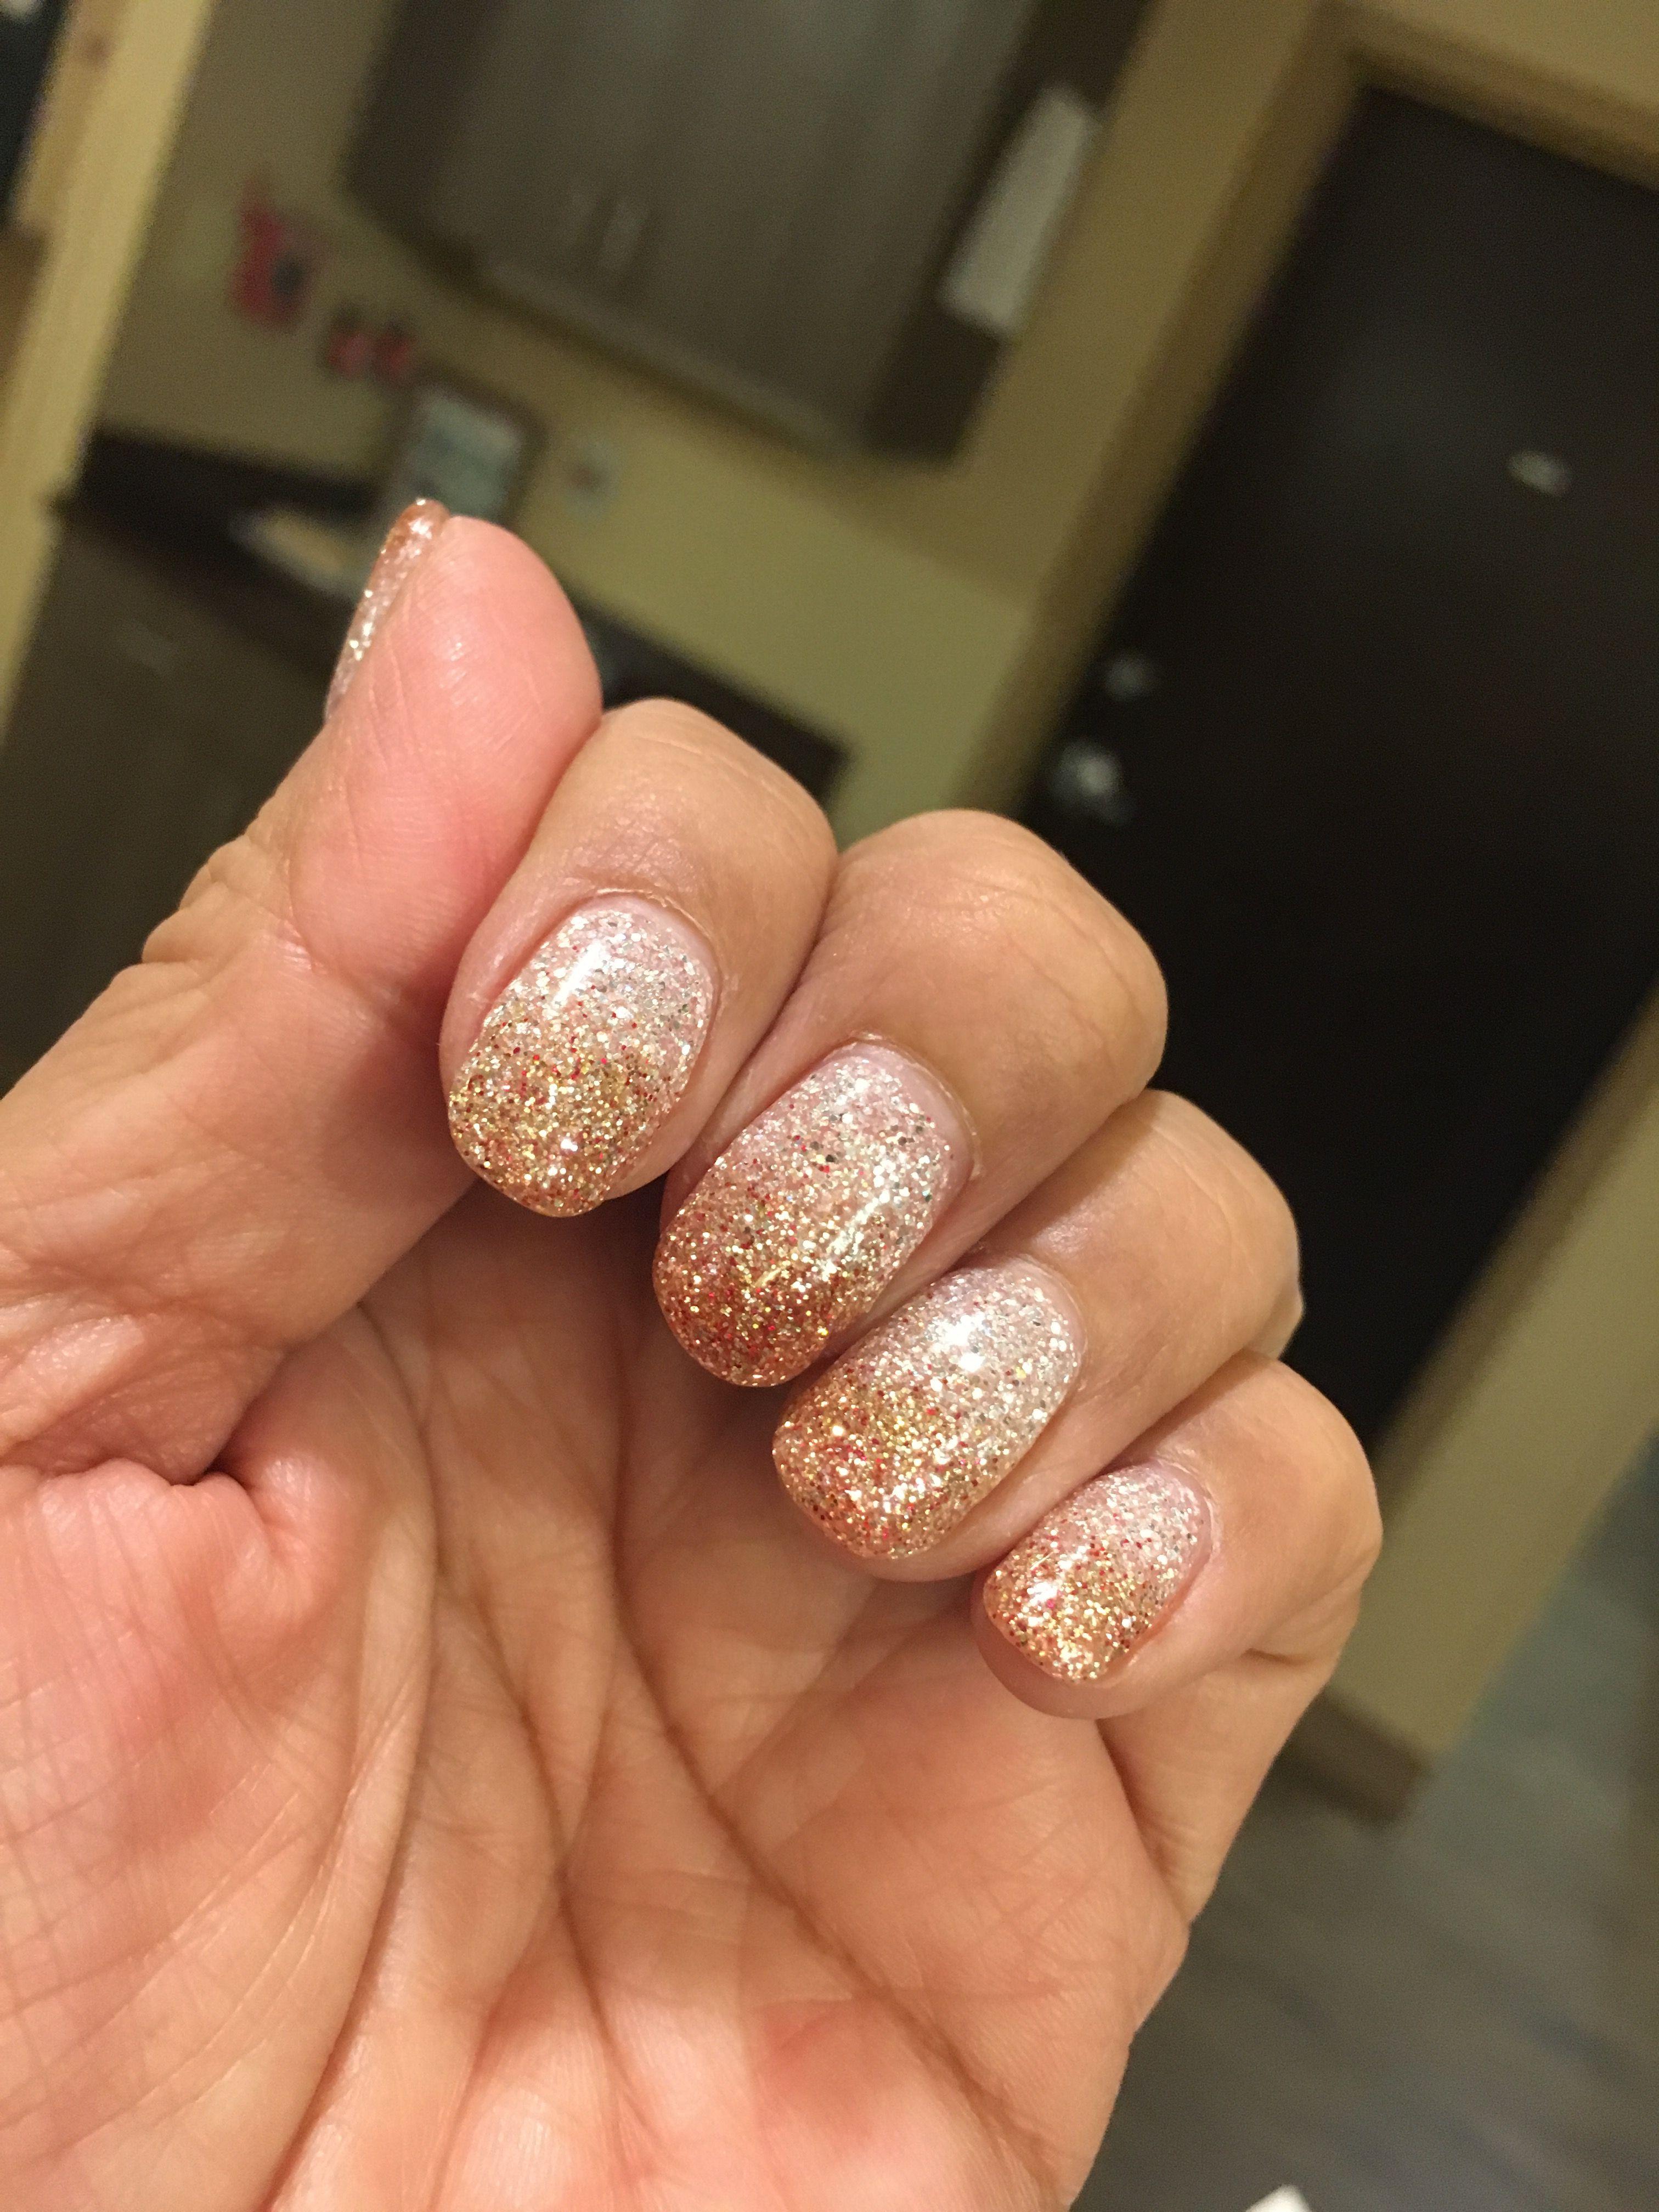 Pin by Lynn Abuogi on Henna & Nails   Henna nails, Nails